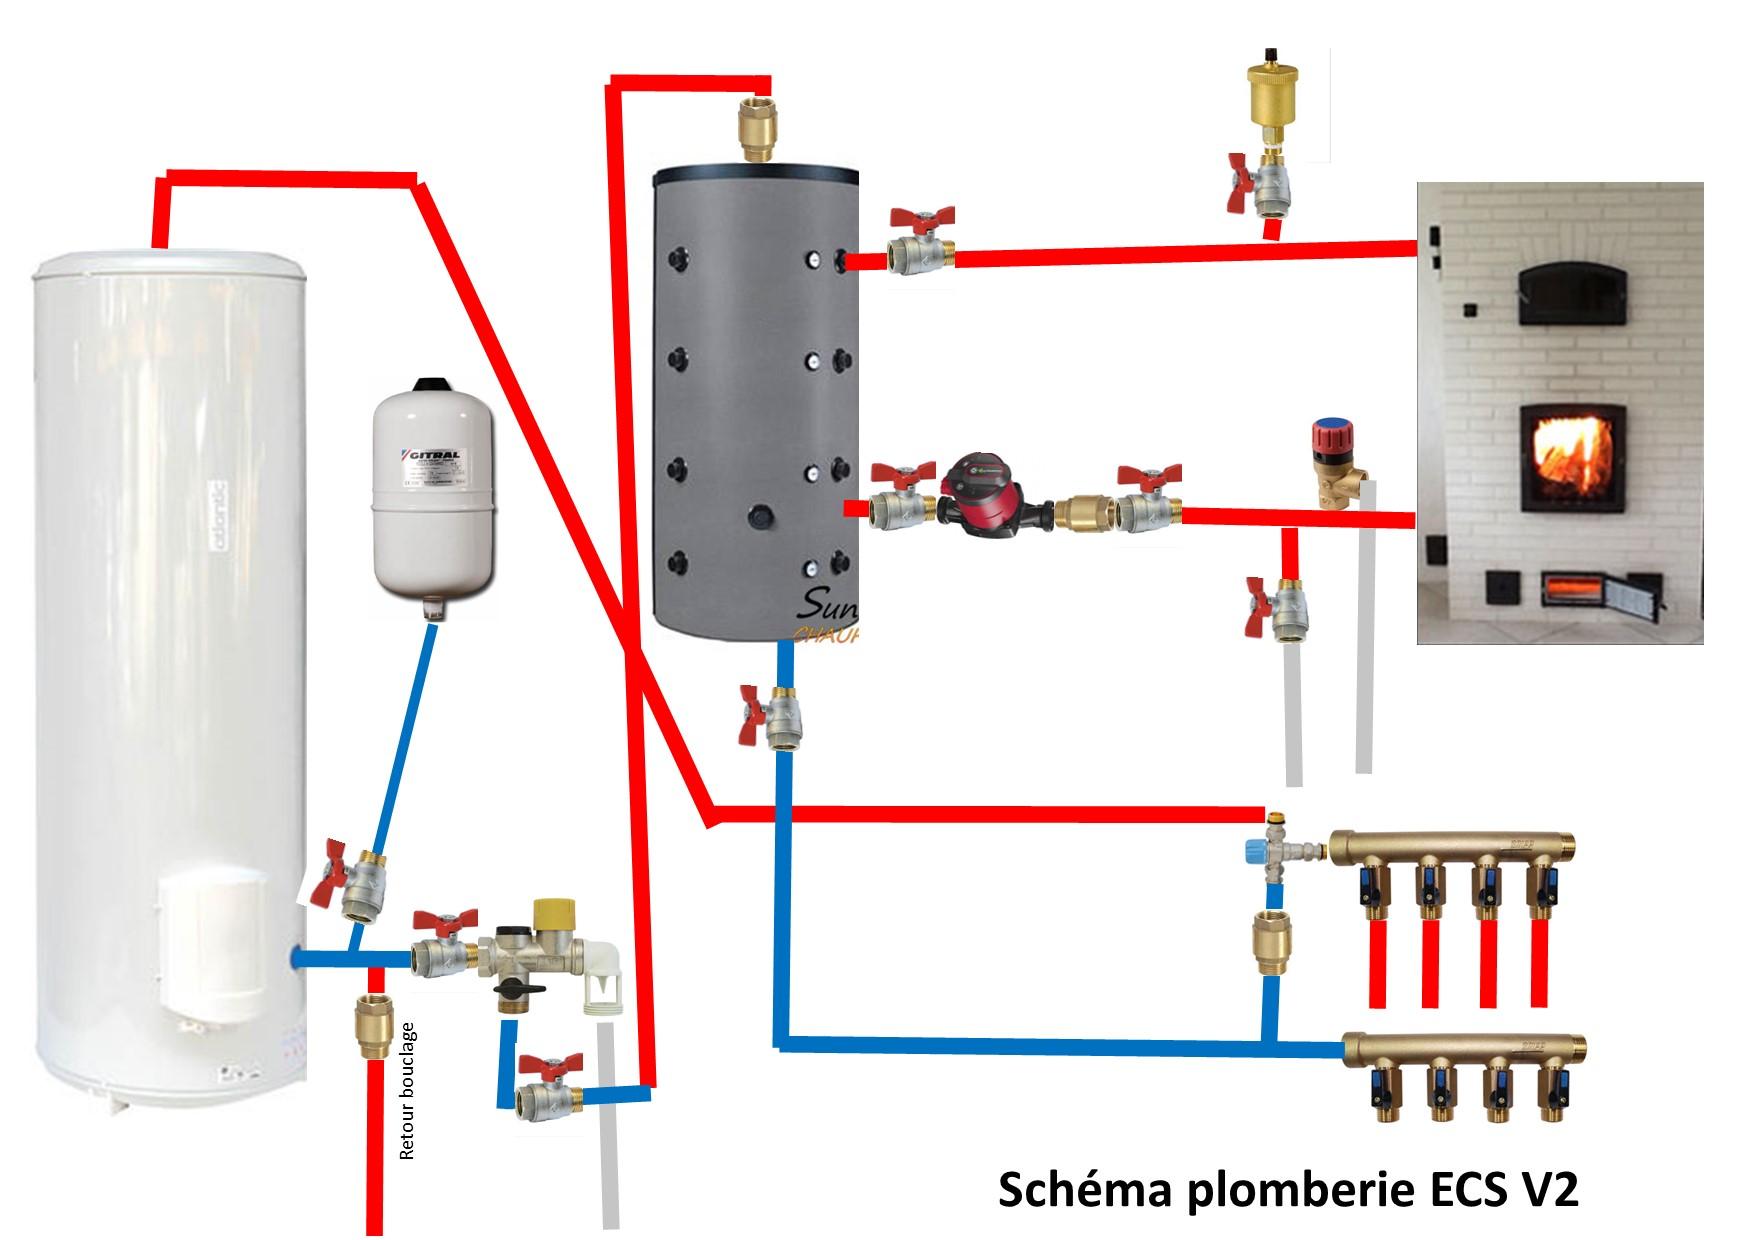 schéma plomberie ECS v2.jpg, 203.1 kb, 1754 x 1240